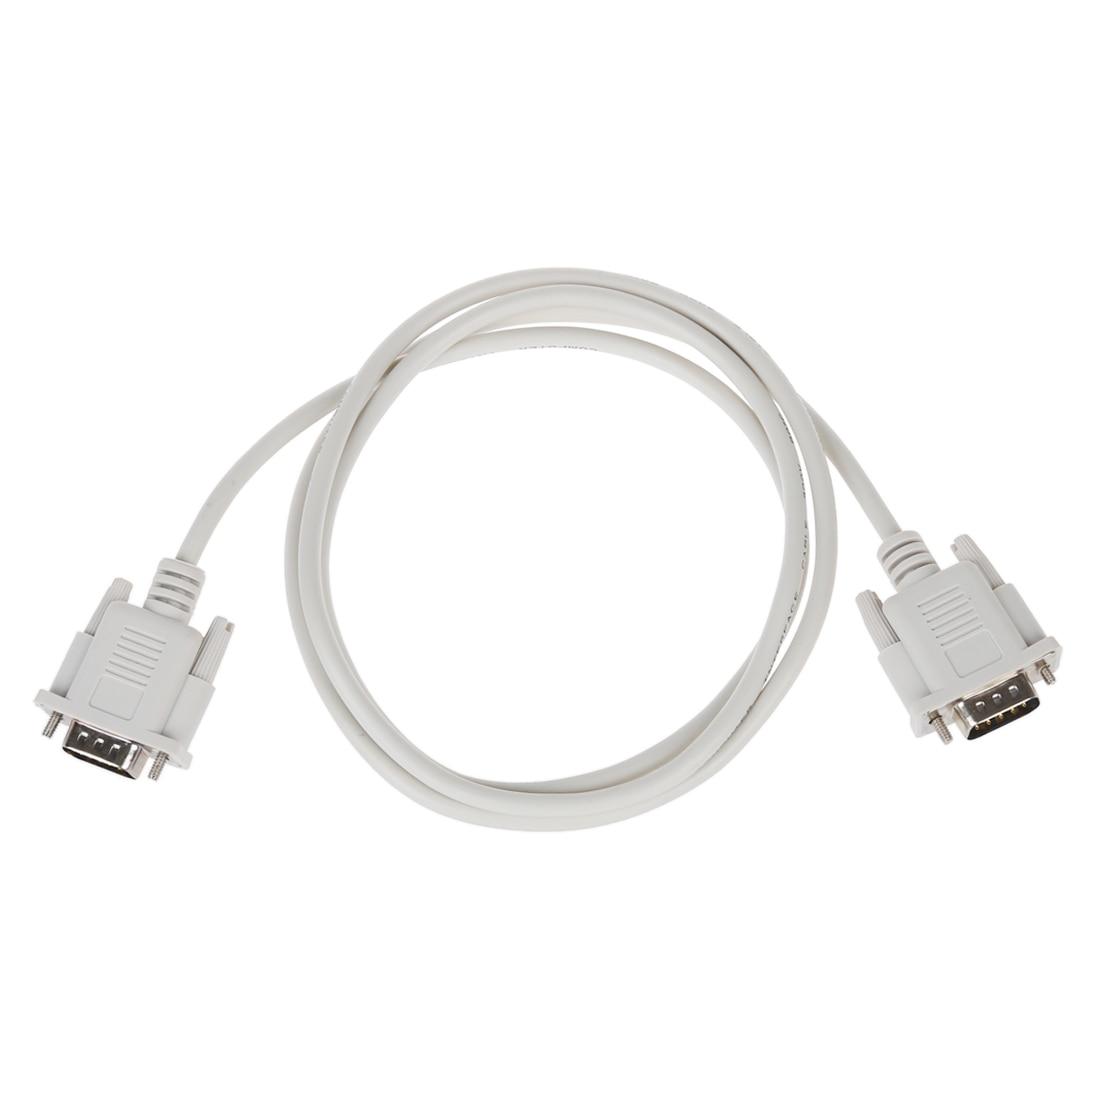 Compra Db9 To Vga Adapter Y Disfruta Del Envo Gratuito En Rj45 Wiring Diagram Hembra A De 9 Pines Serie Aliexpresscom